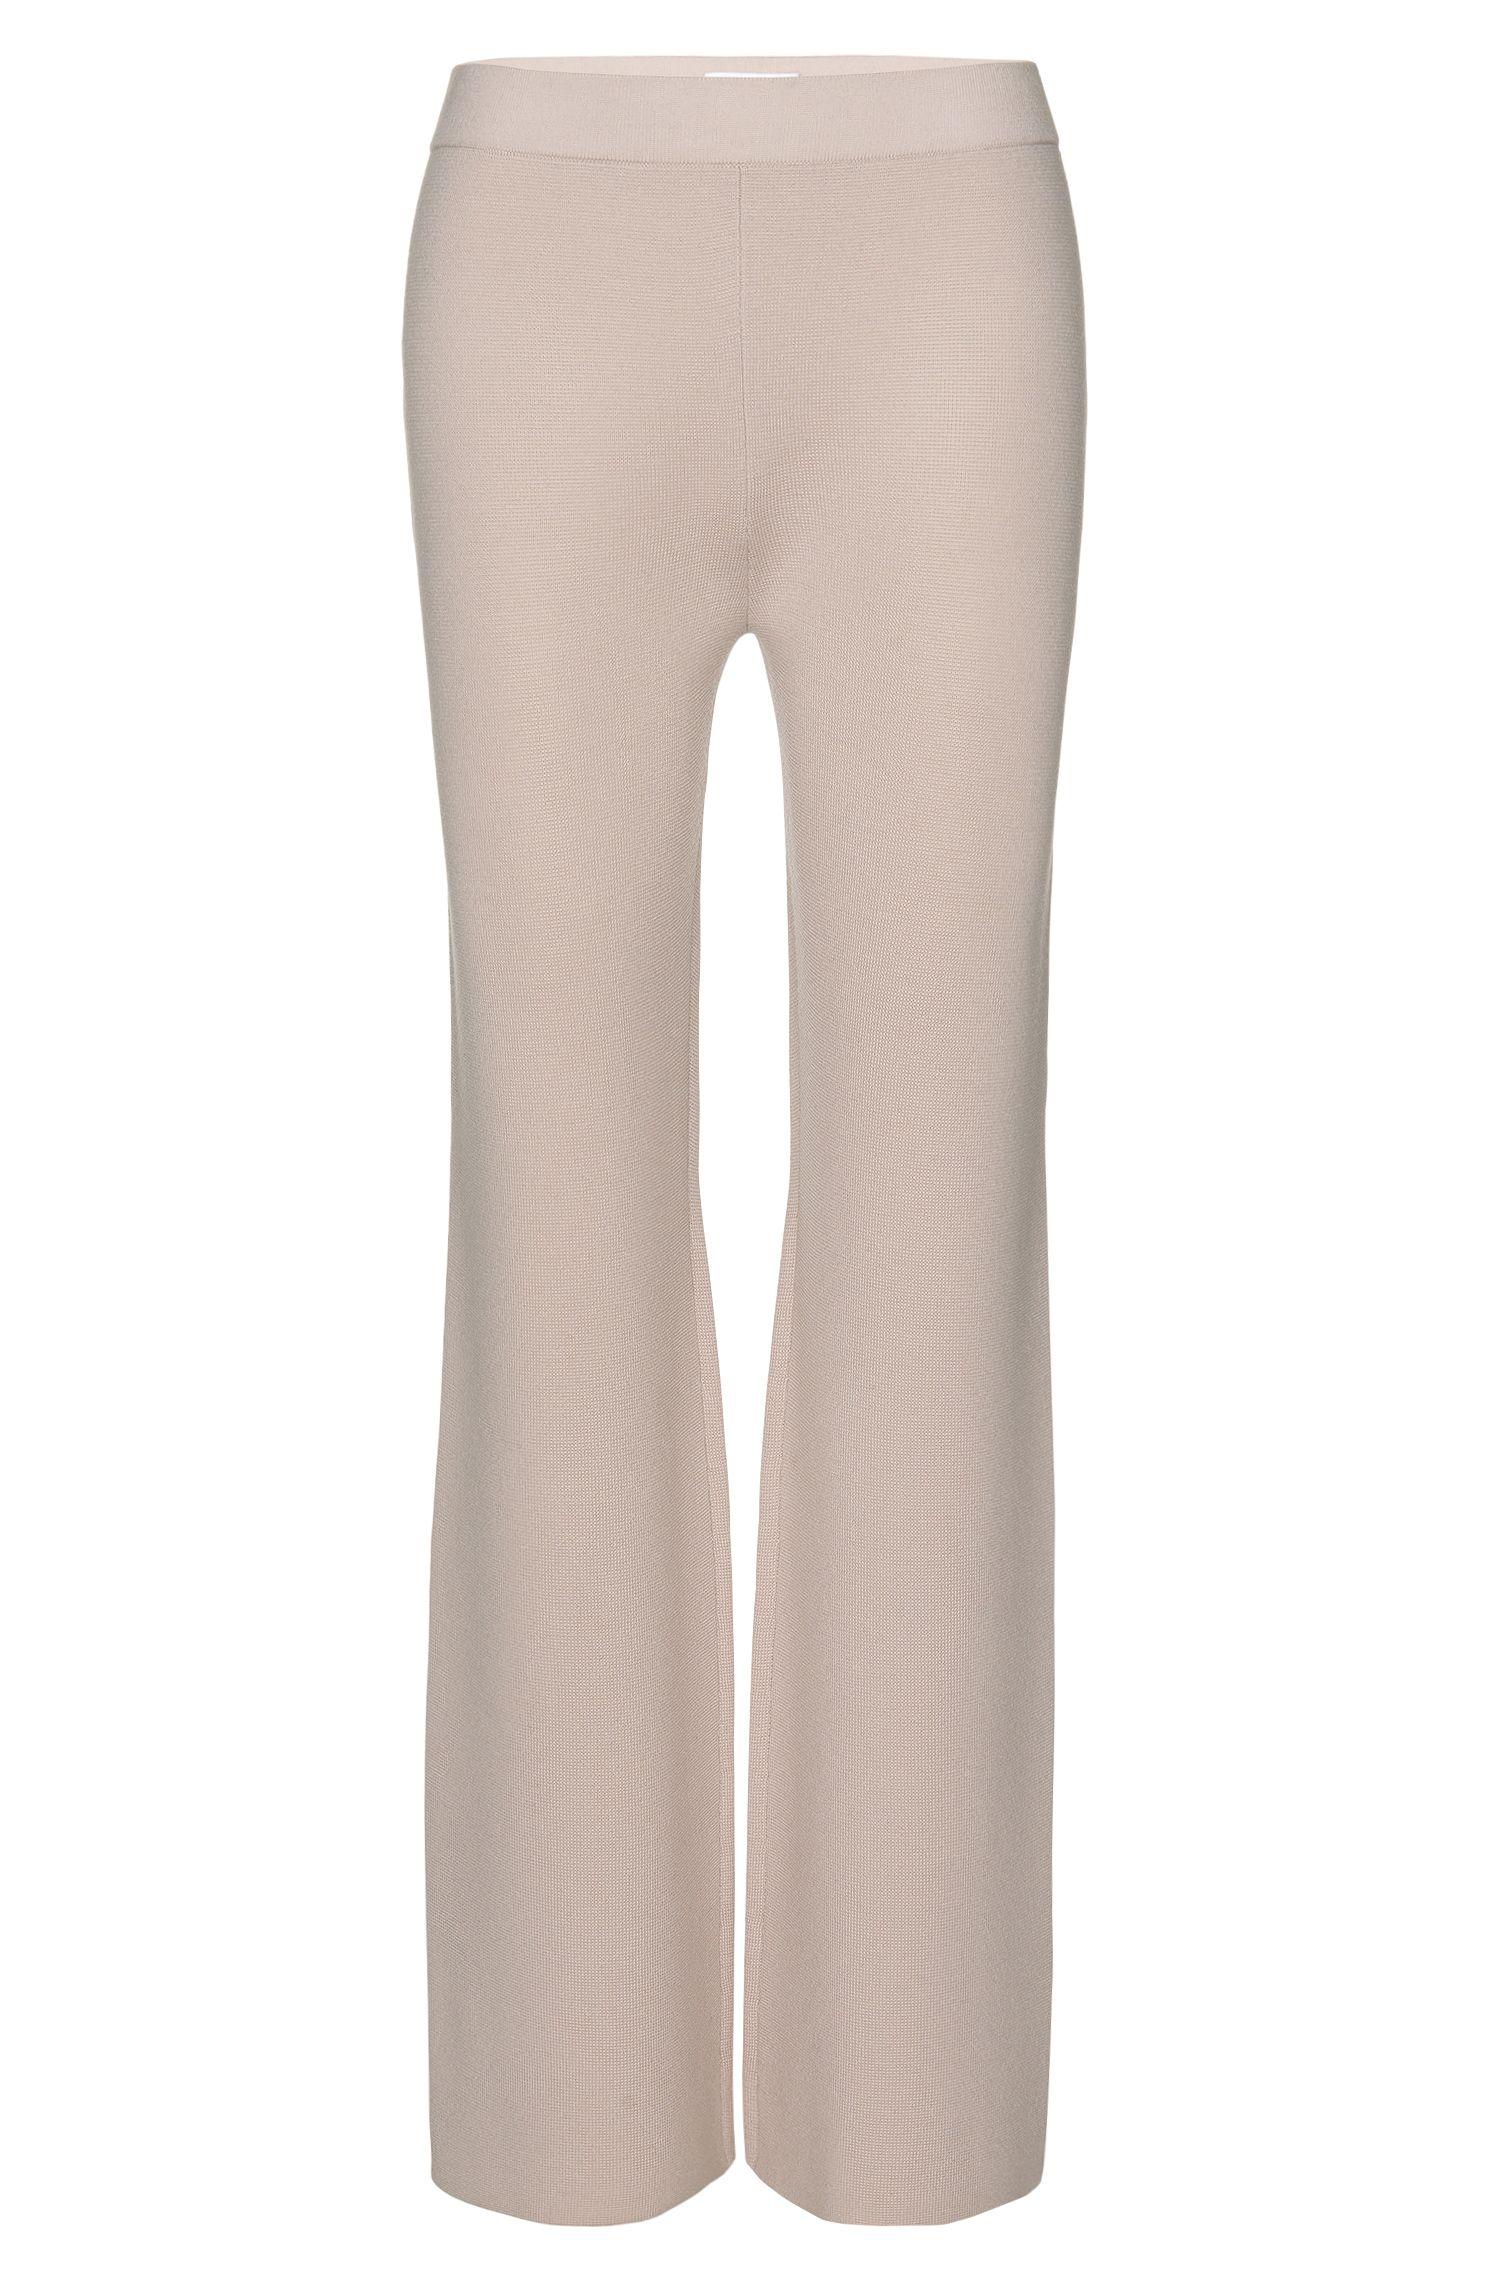 'Falali' | Mercerized Virgin Wool Knit Pants